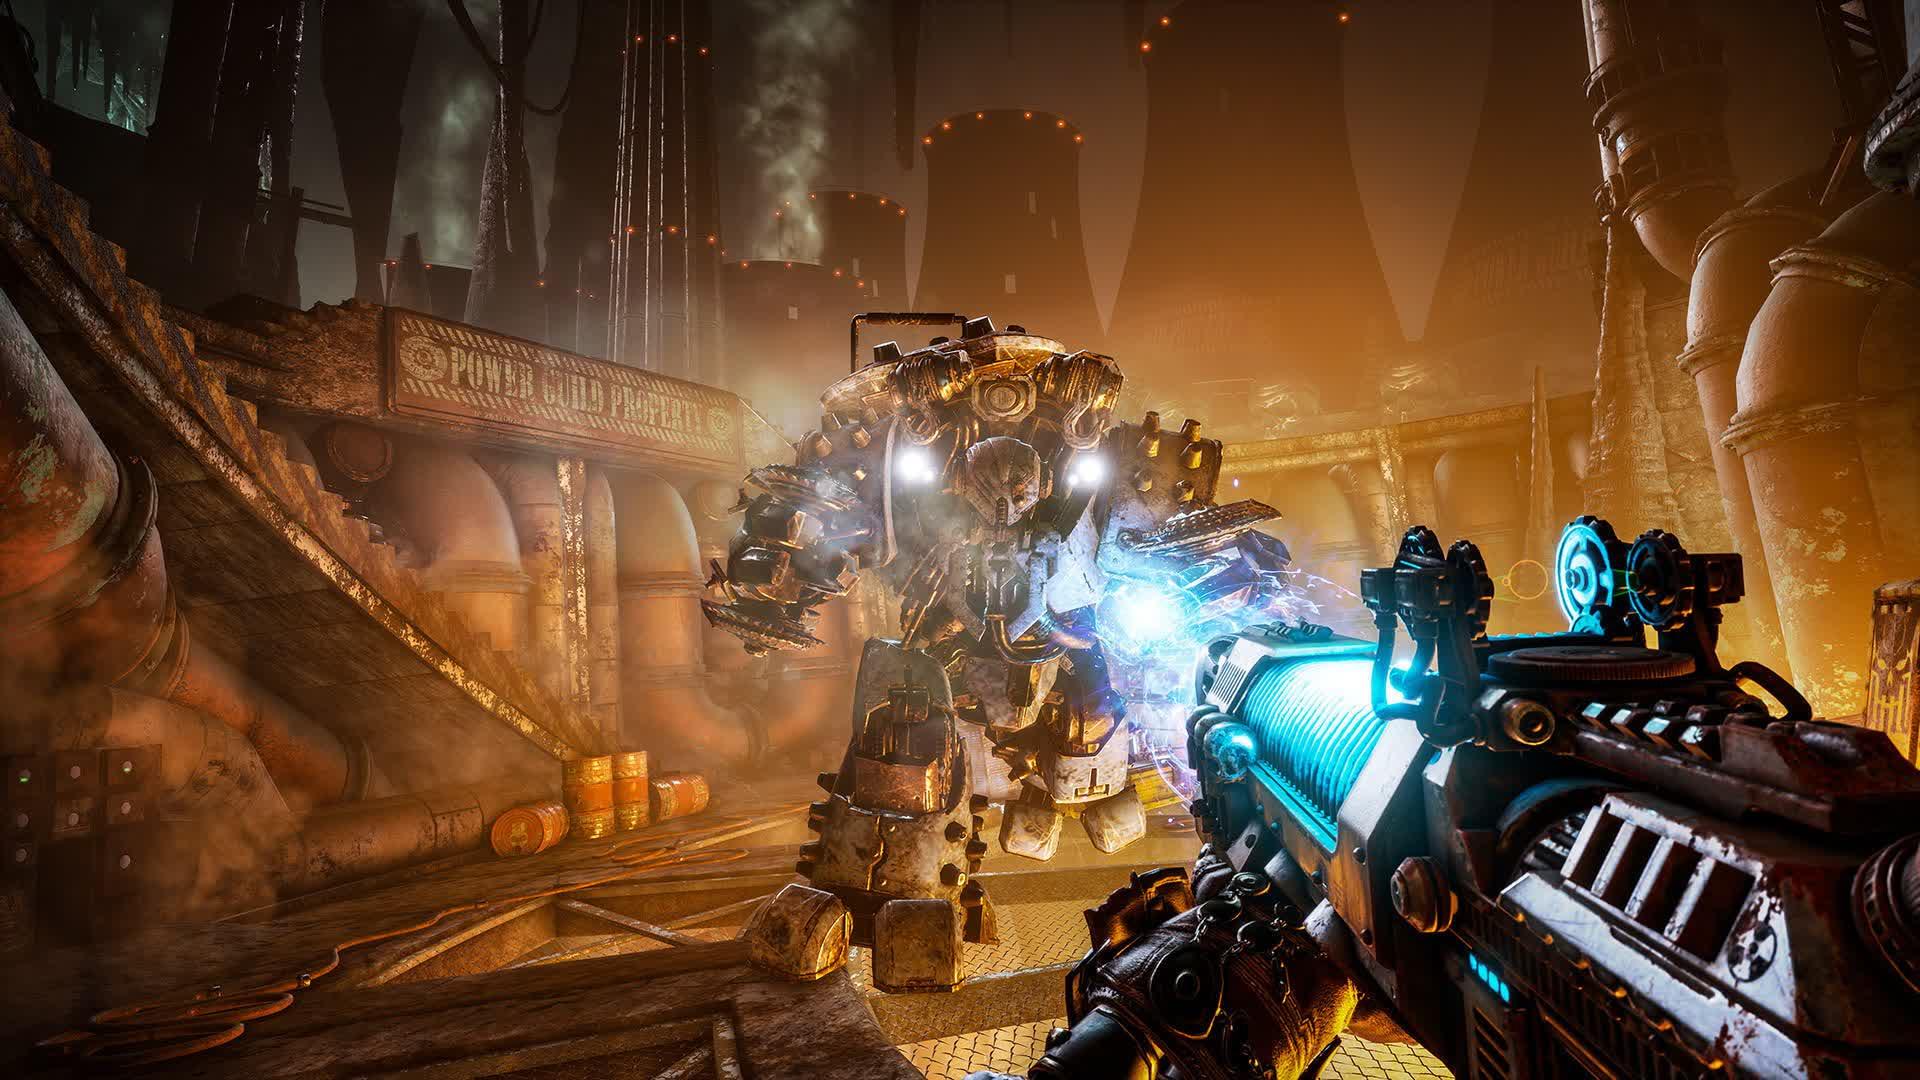 Watch the Necromunda: Hired Gun trailer; Doom meets Titanfall 2 in the Warhammer 40K universe ...